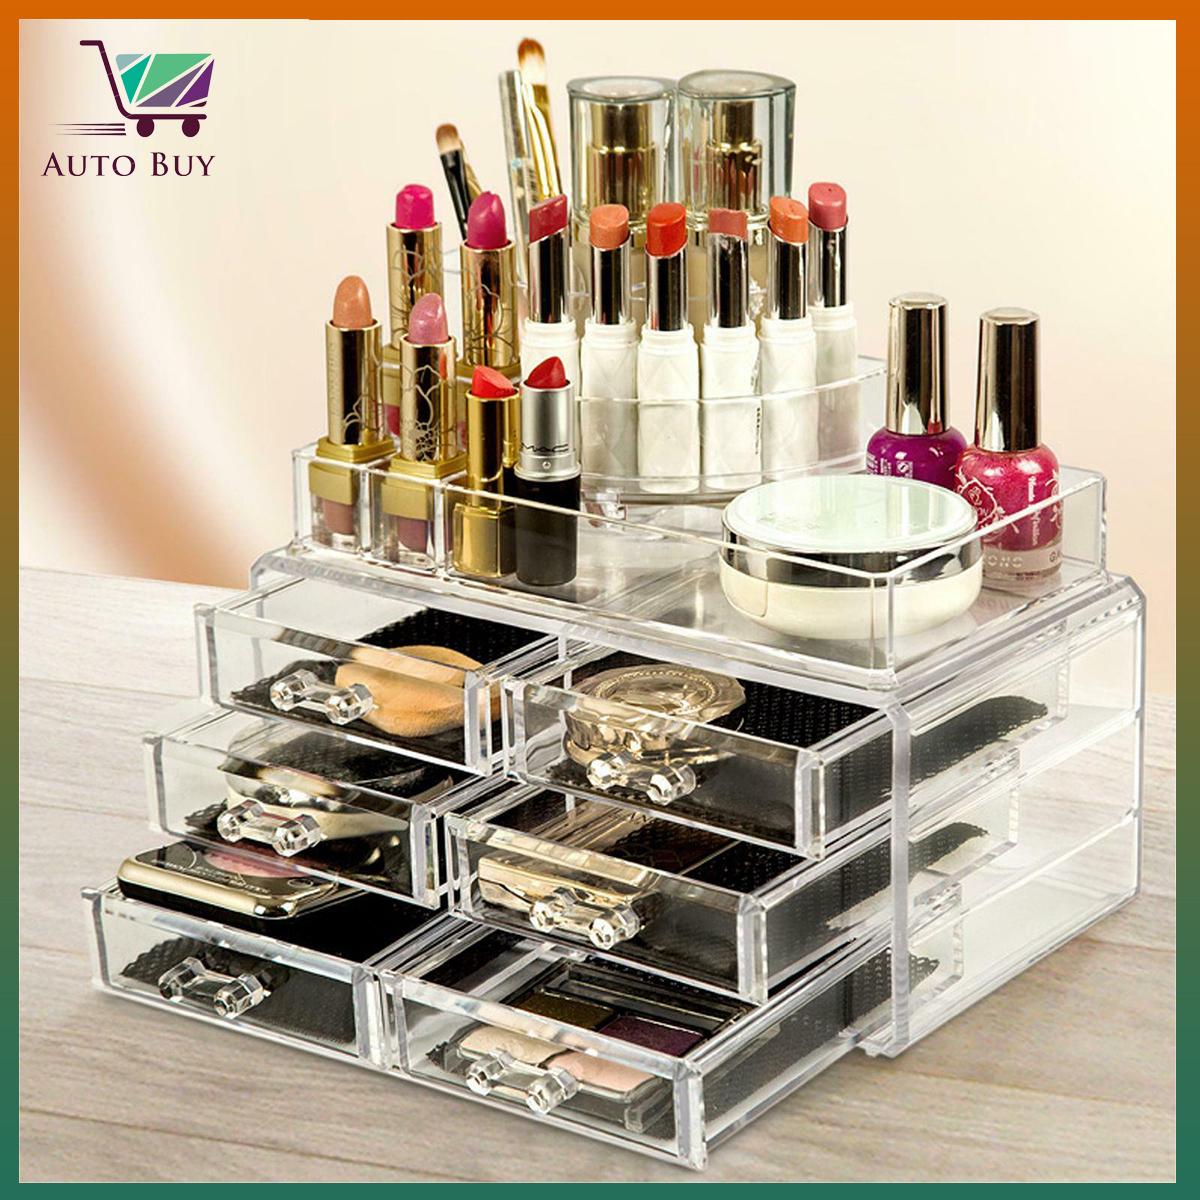 Plastic Acrylic 6 Drawers Jewelry Cosmetic Organizer Good Qaulity Cheap Price Make Up Organizer Makeup Organizer Holder Box Case - High Quality Organizer